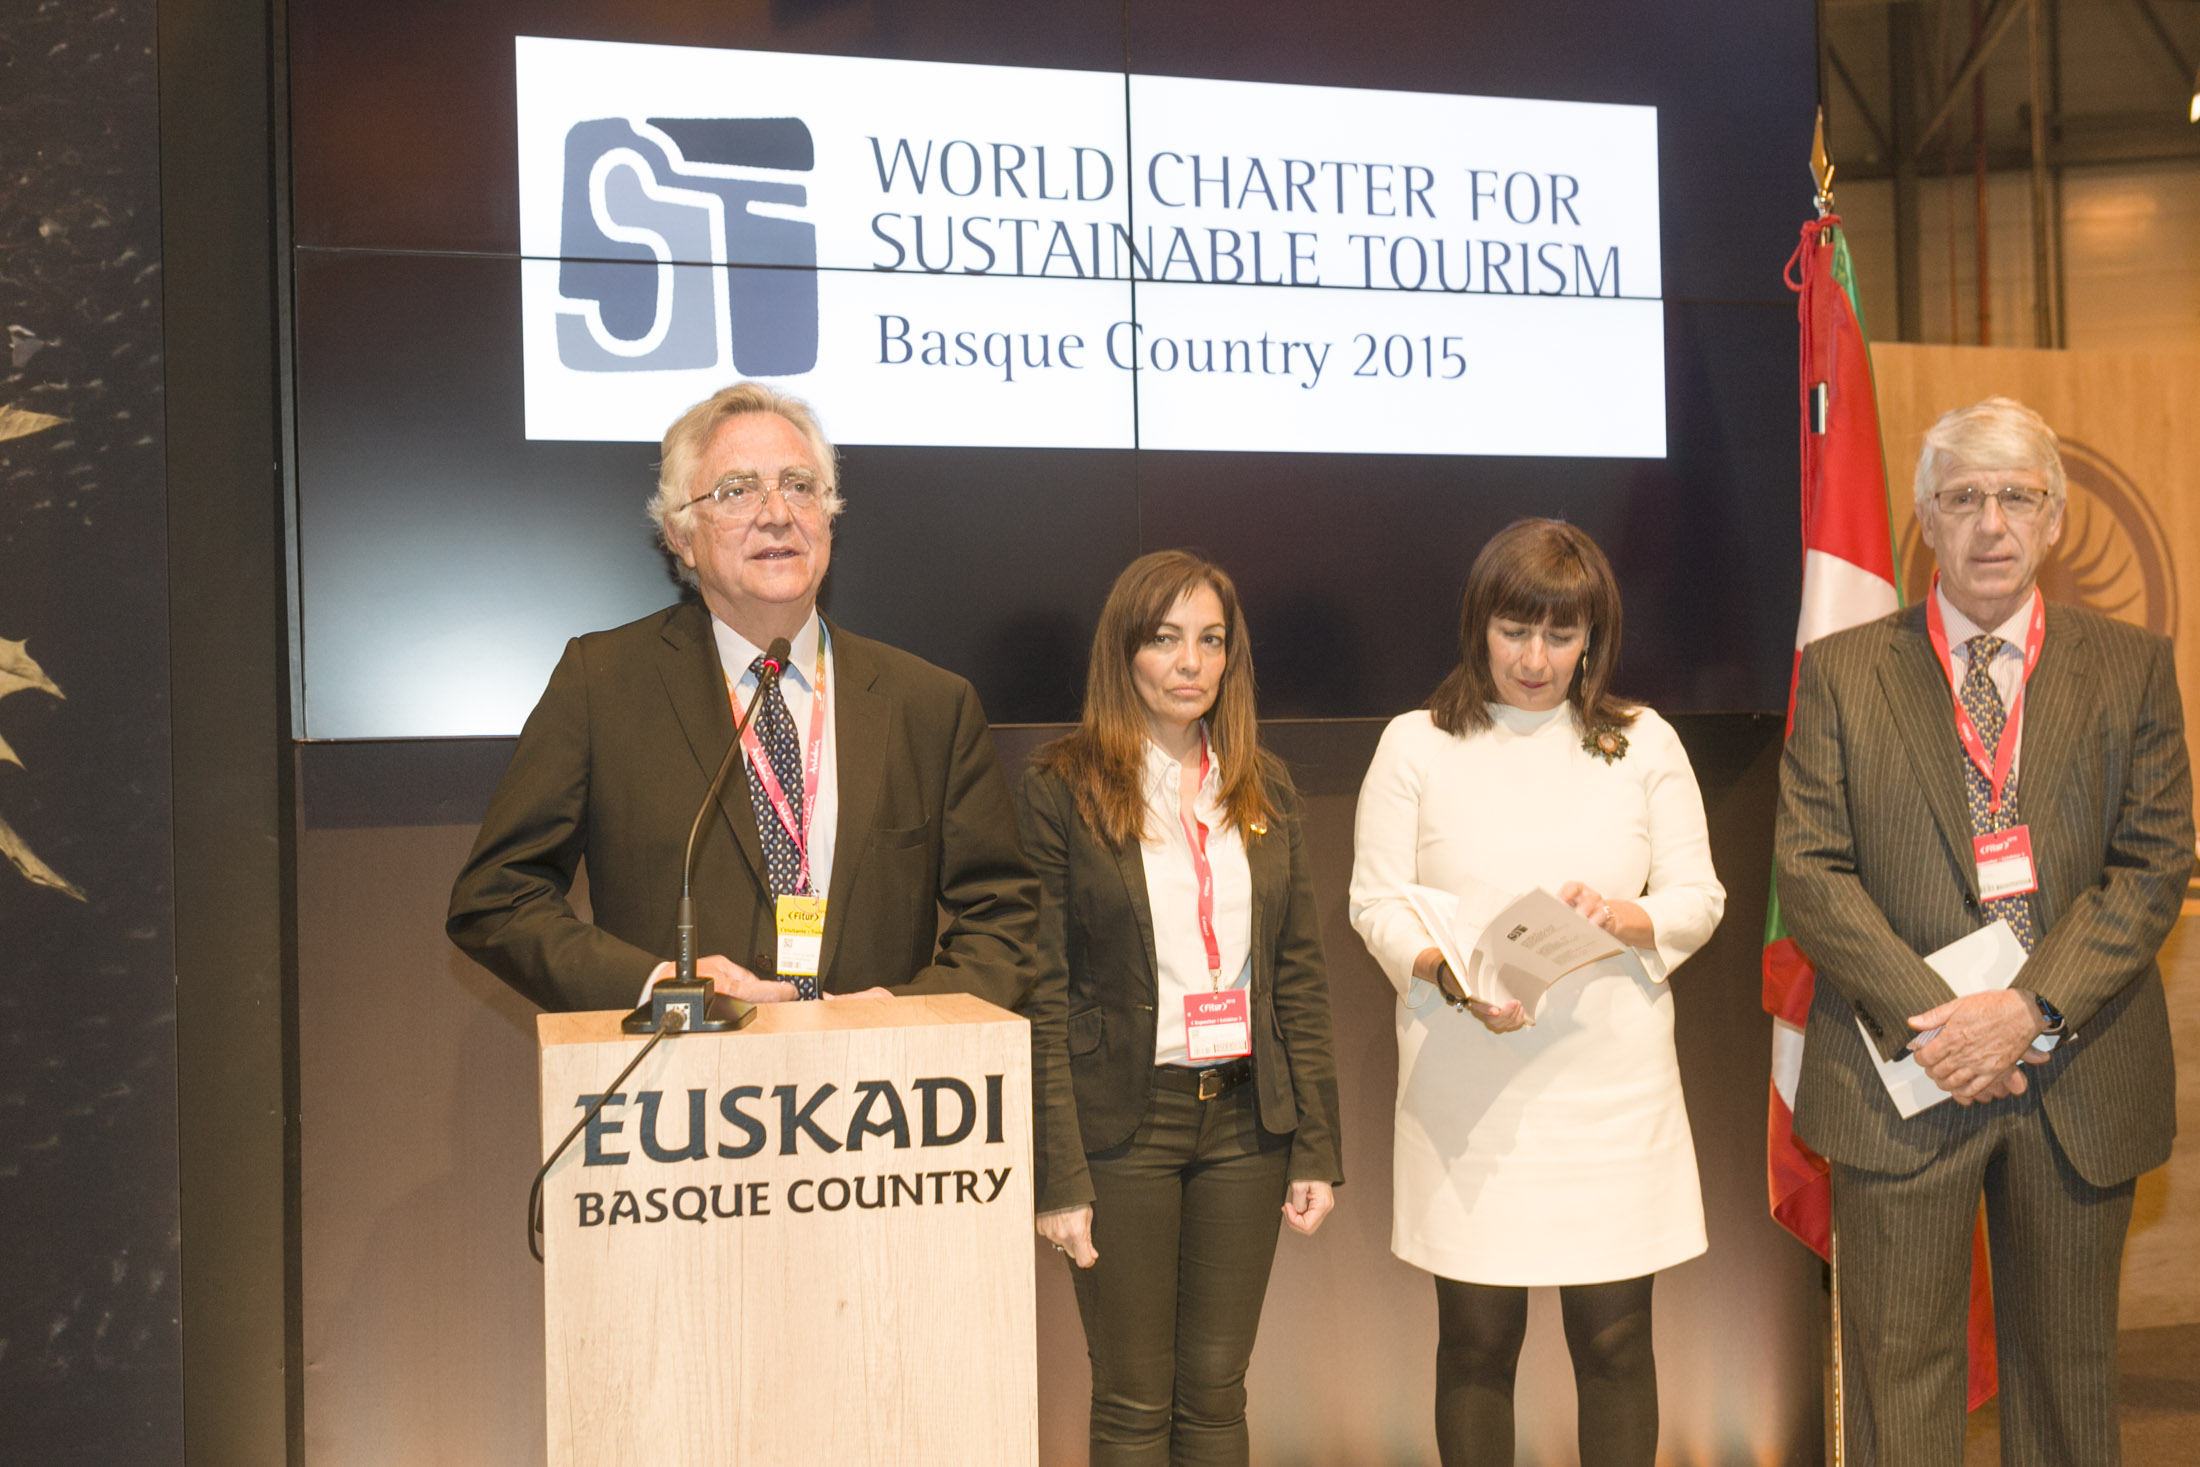 epalza_carta_turismo_sostenible_04.jpg